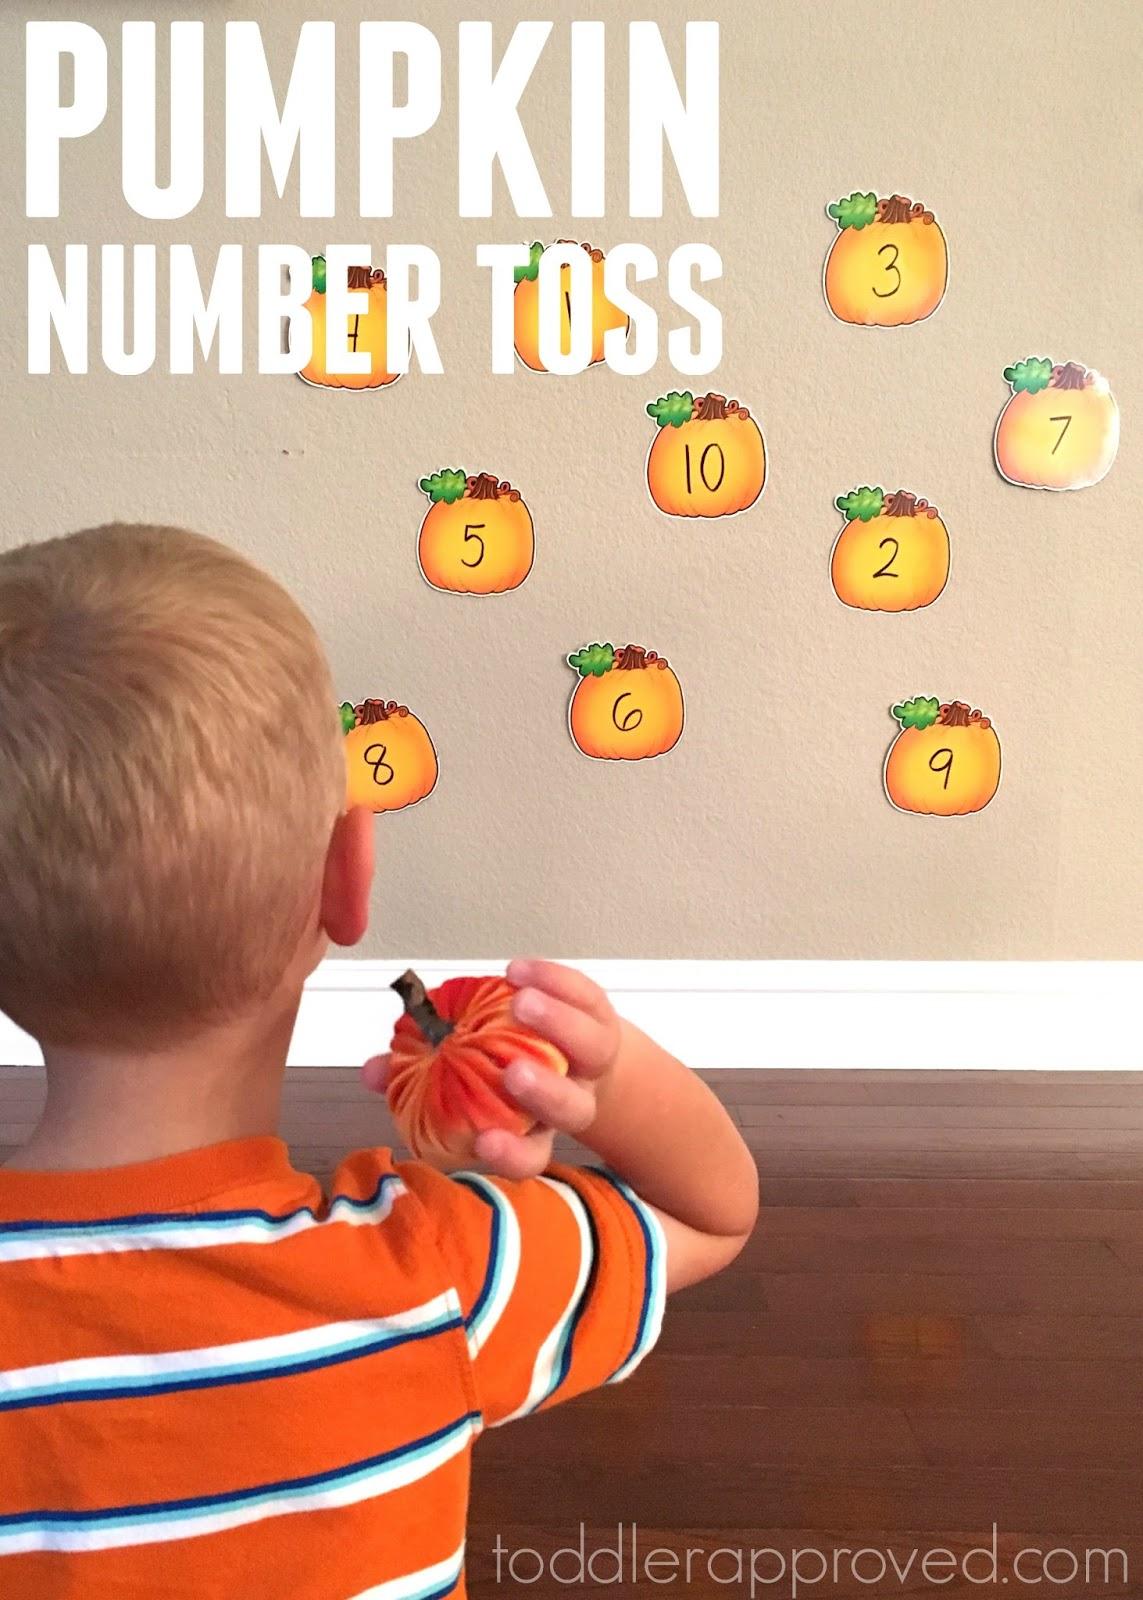 Toddler Approved Pumpkin Number Toss Game For Kids